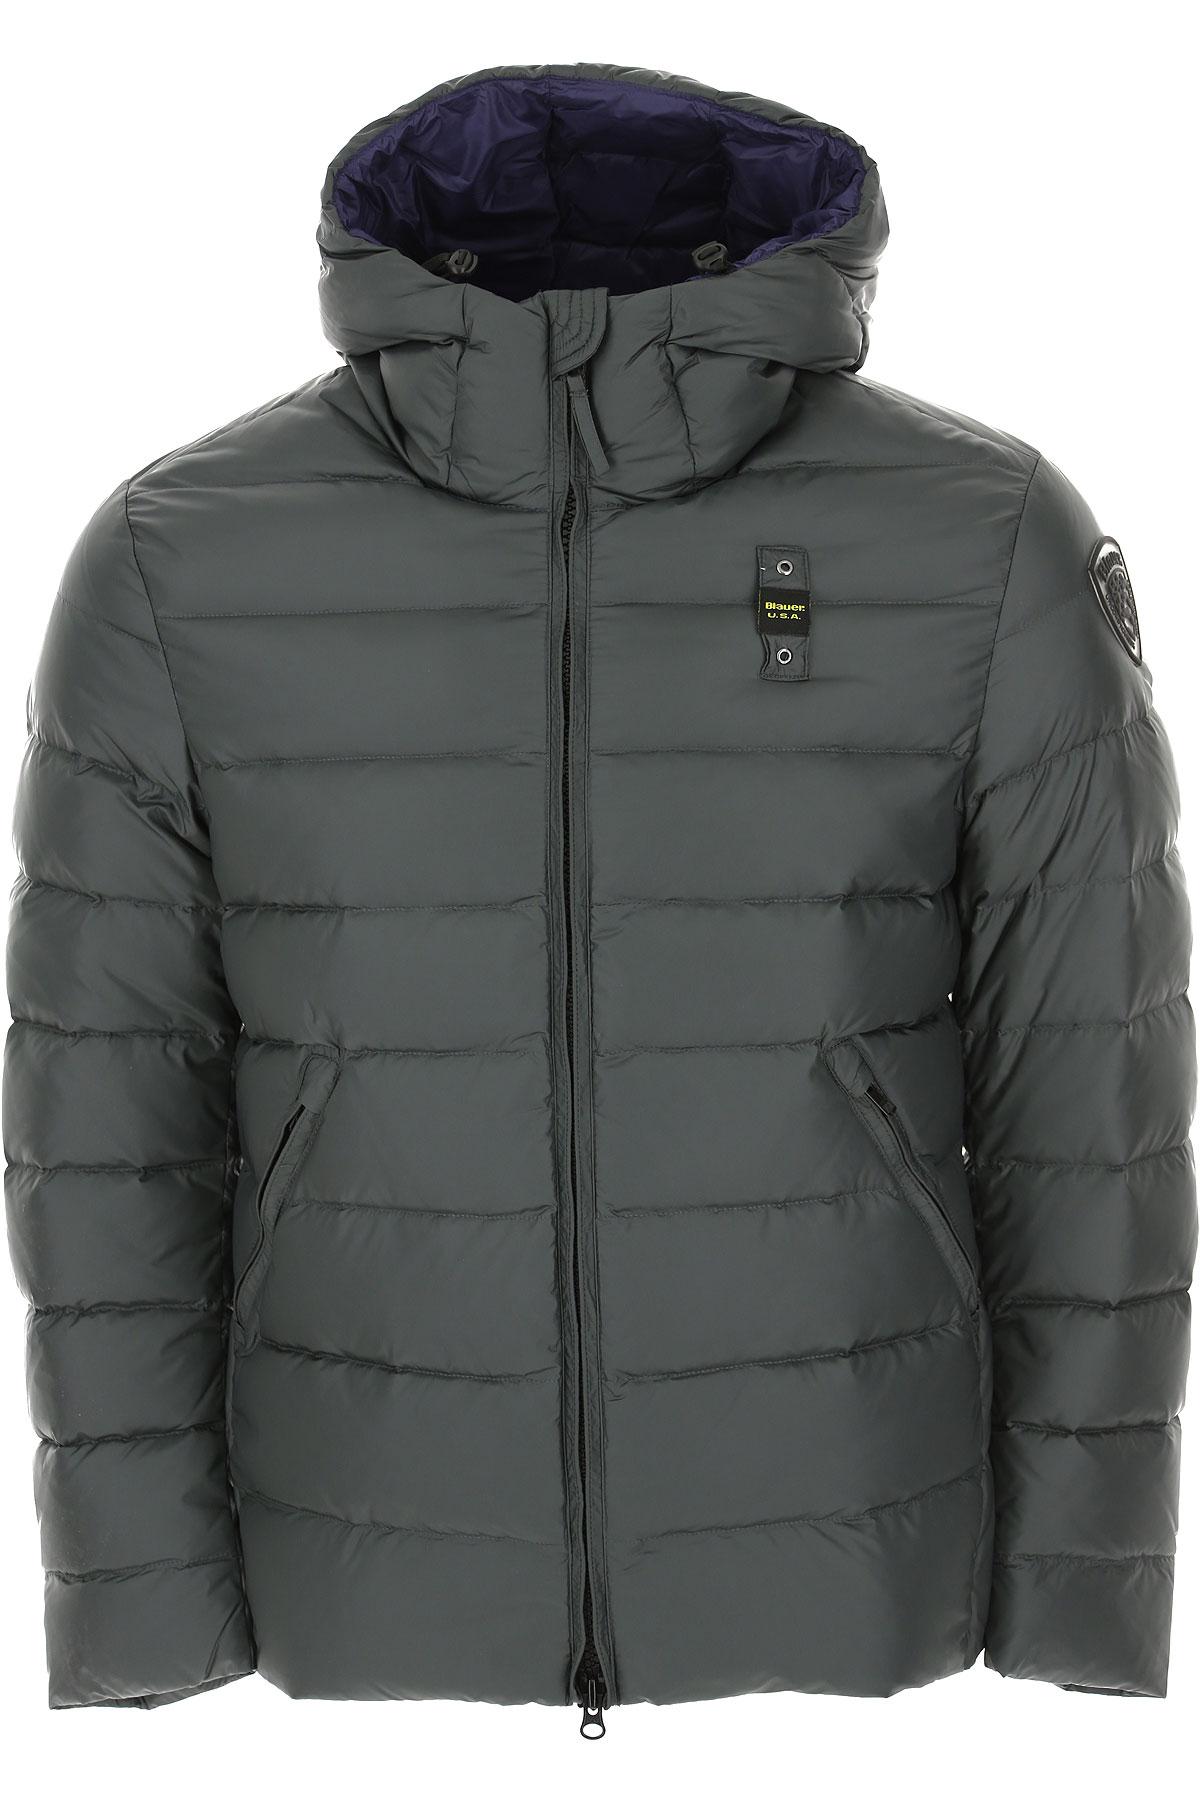 Blauer Down Jacket for Men, Puffer Ski Jacket On Sale, Bottle Green, polyamide, 2019, L M S XL